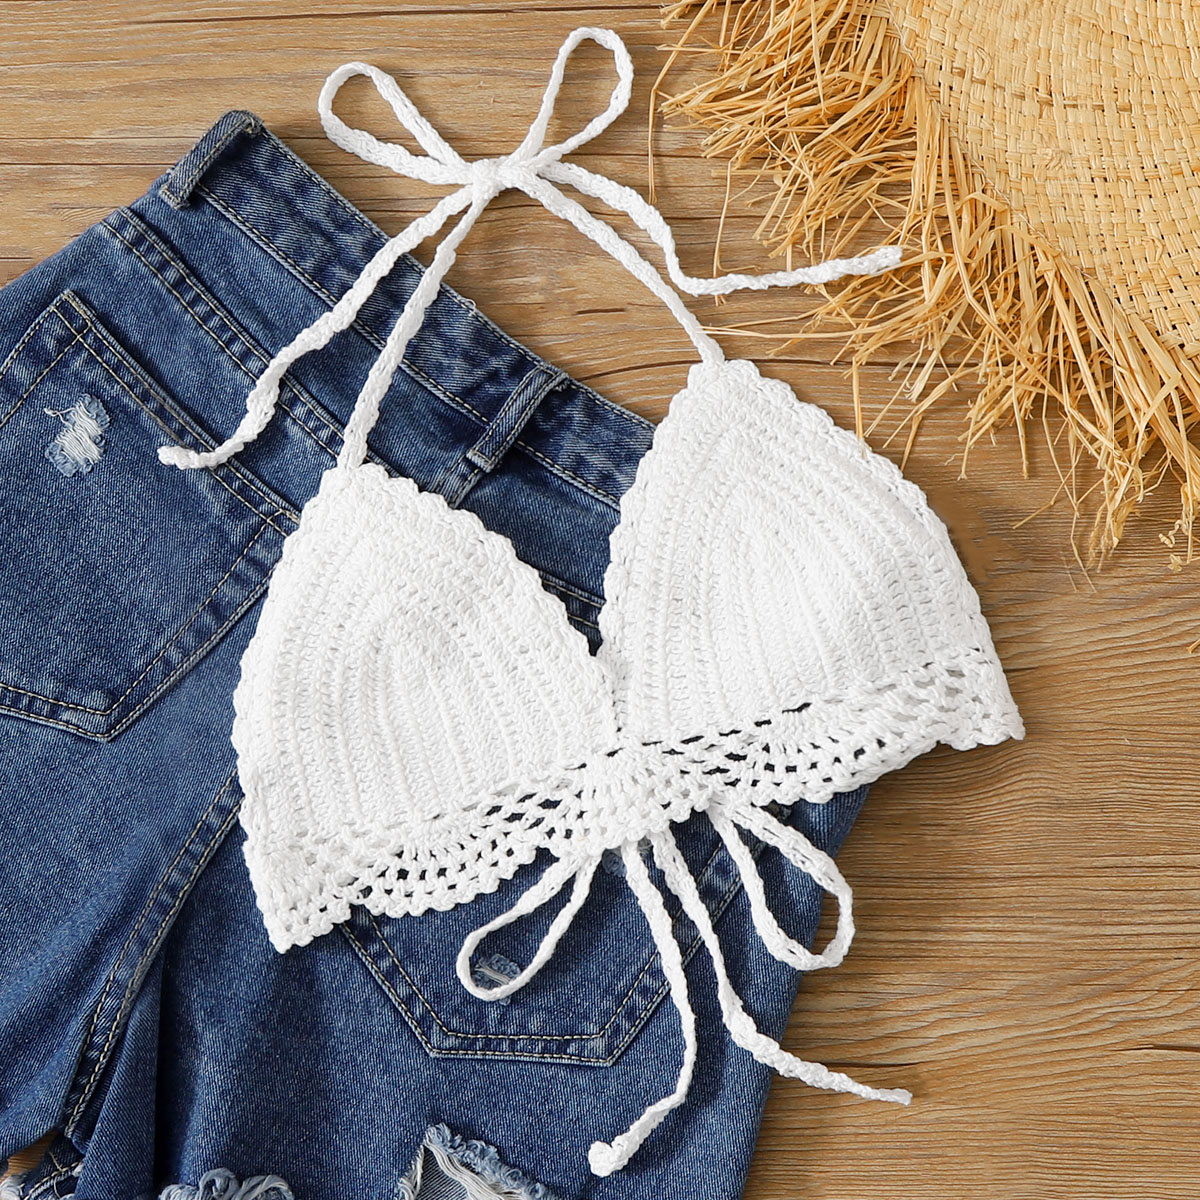 SHEIN / Top bikini triángulo en abanico de croché